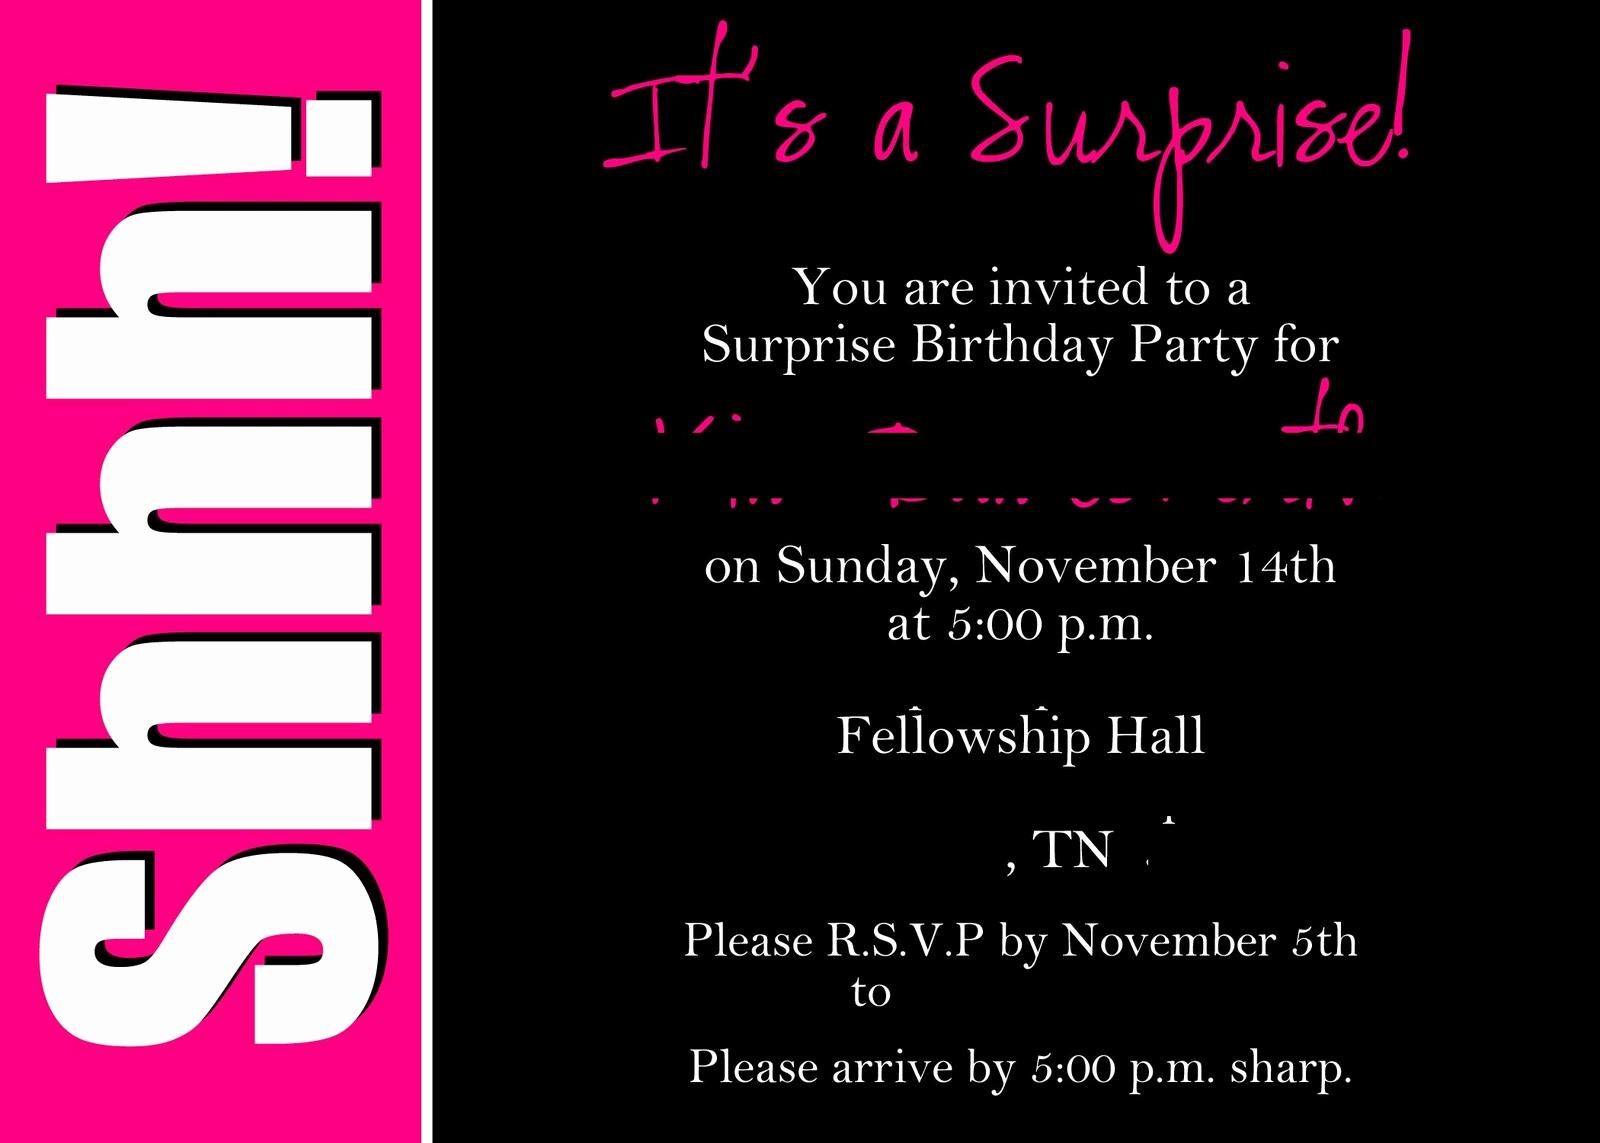 Suprise Party Invitation Wording Inspirational Alicia S Delightful Designs Shhhh It S A Surprise